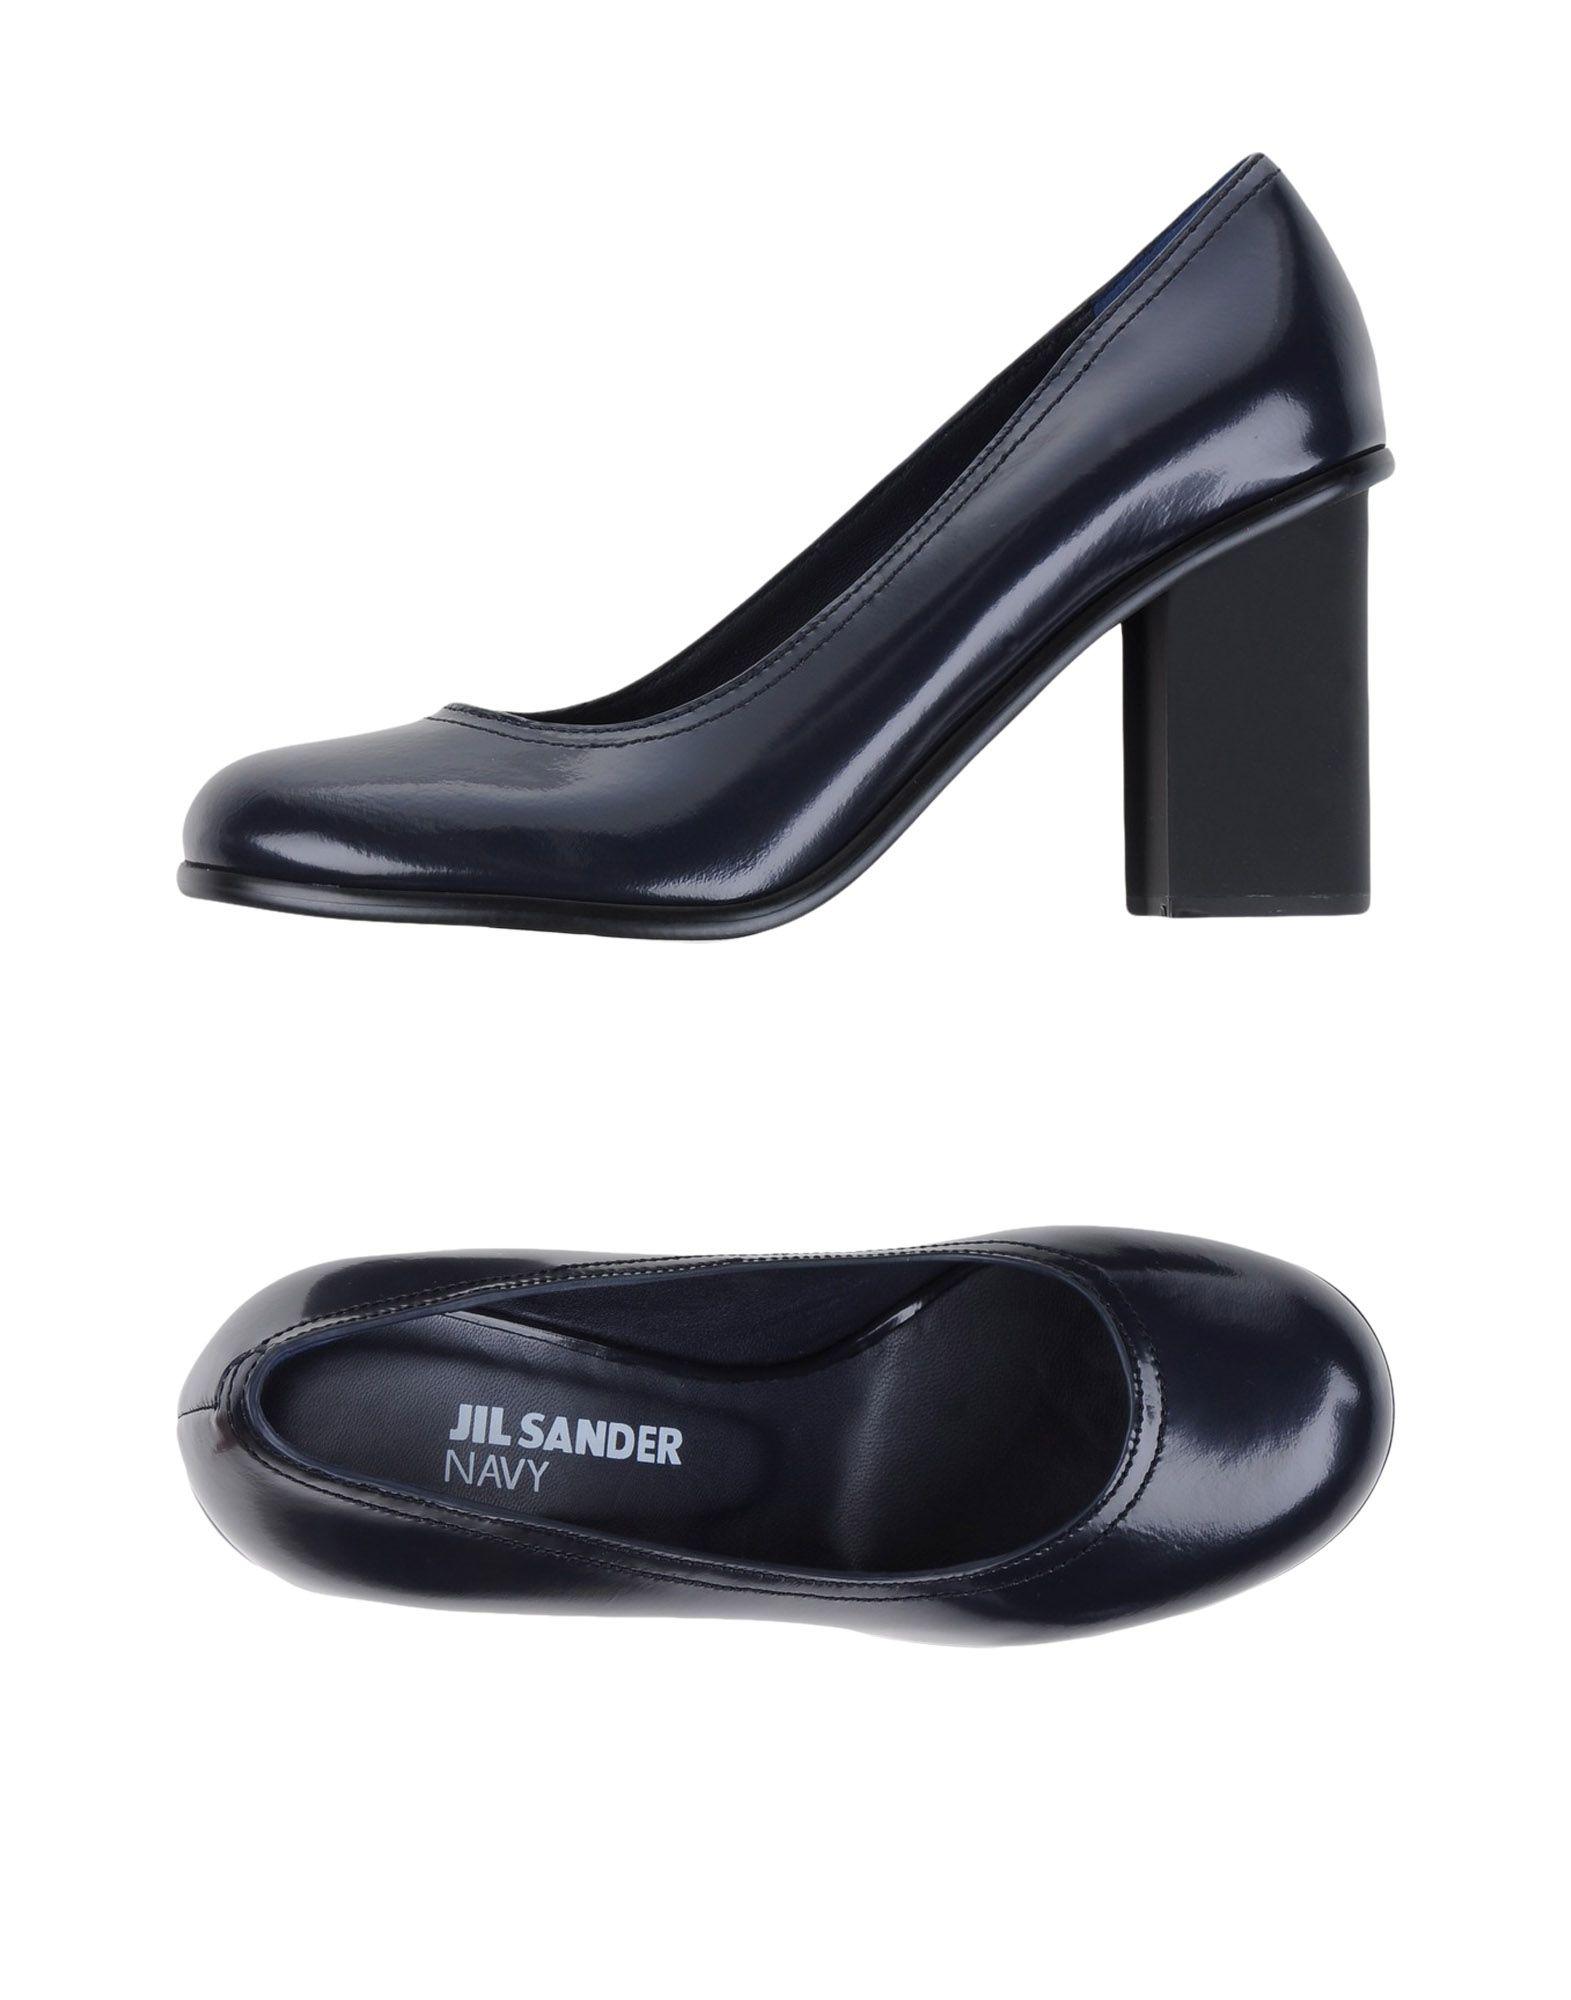 Stilvolle billige Schuhe Jil Sander Navy Pumps Damen  11064594MS